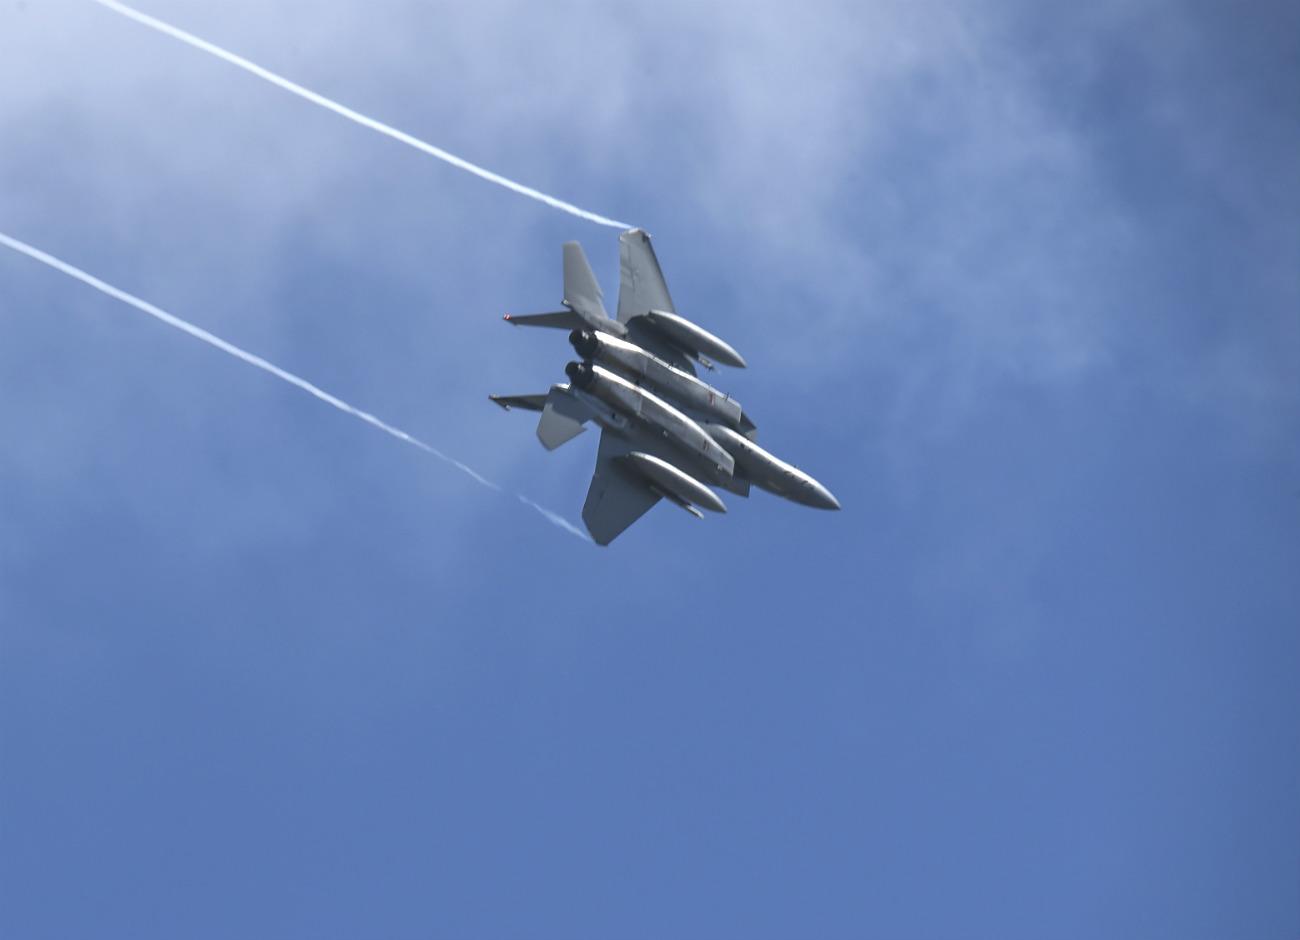 F-15 Eagles vapor trails